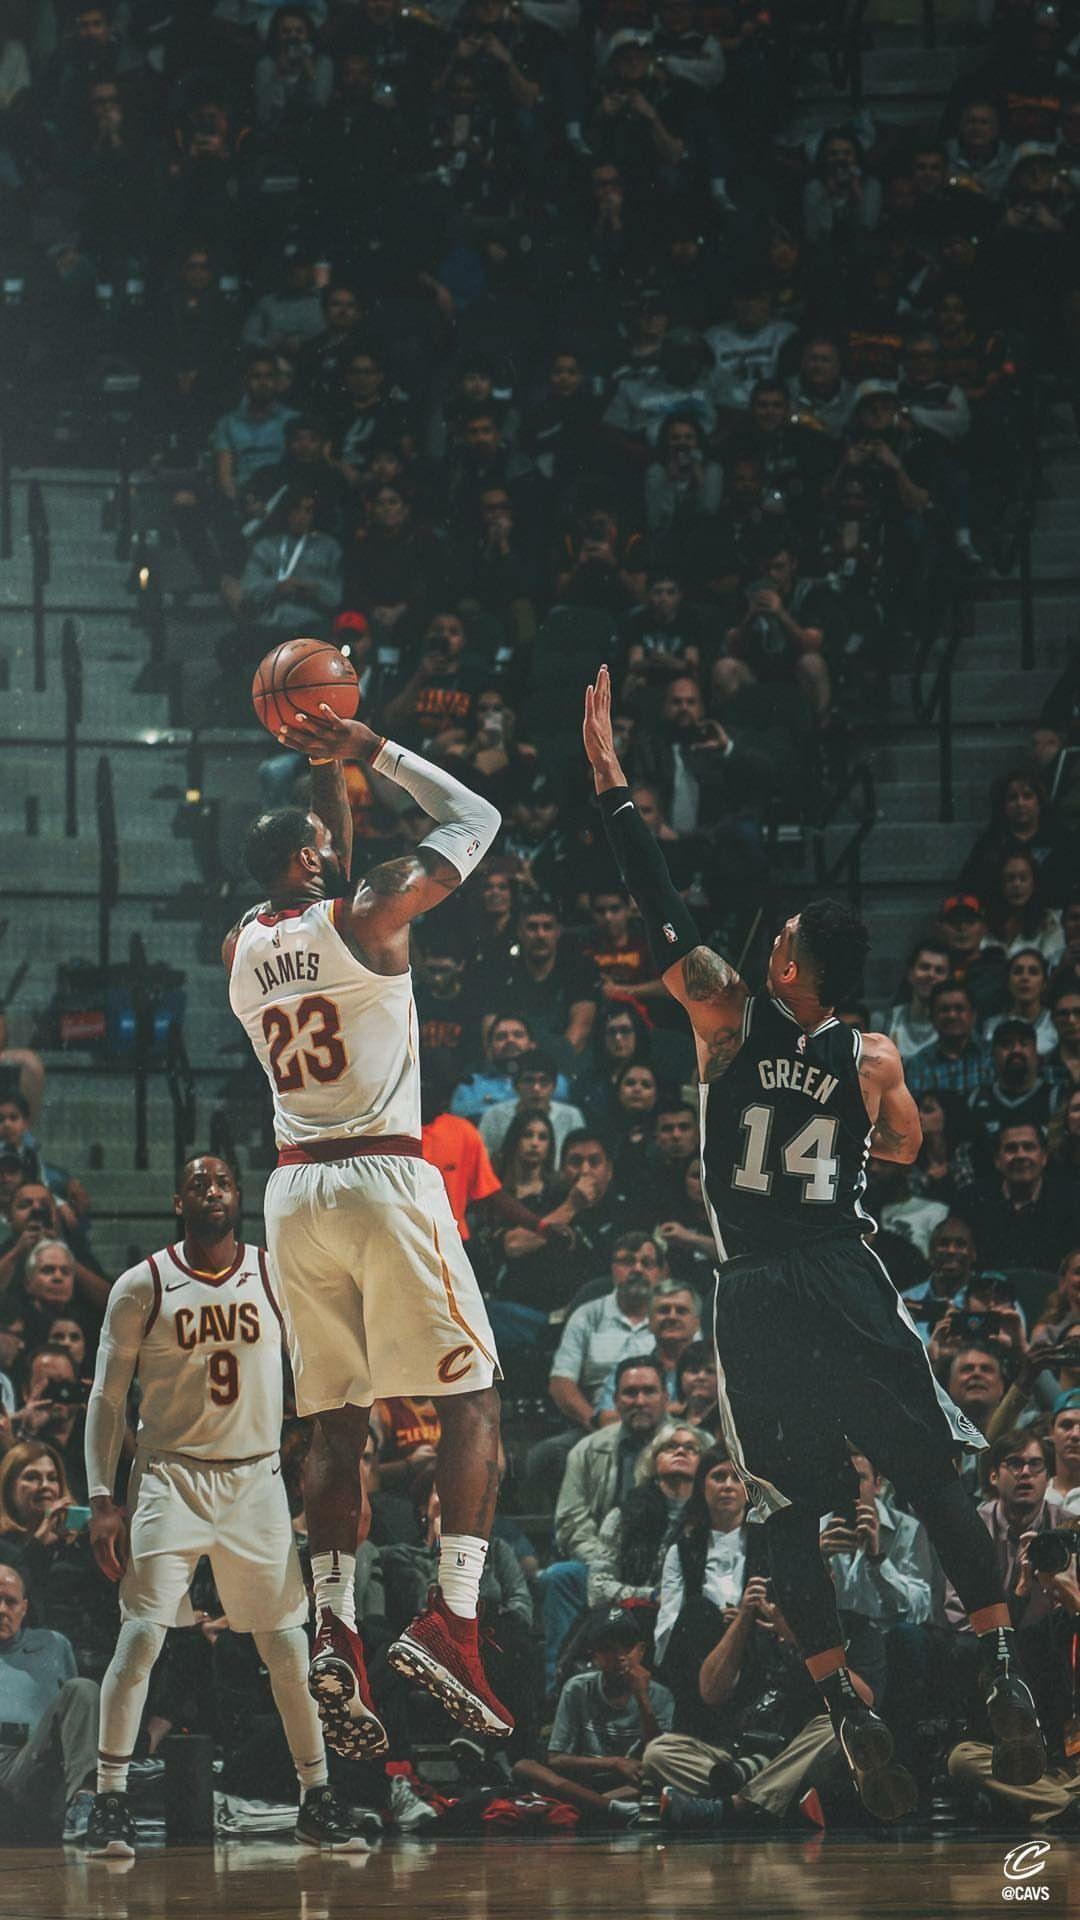 LeBron James 2018 HD Wallpapers - Wallpaper Cave